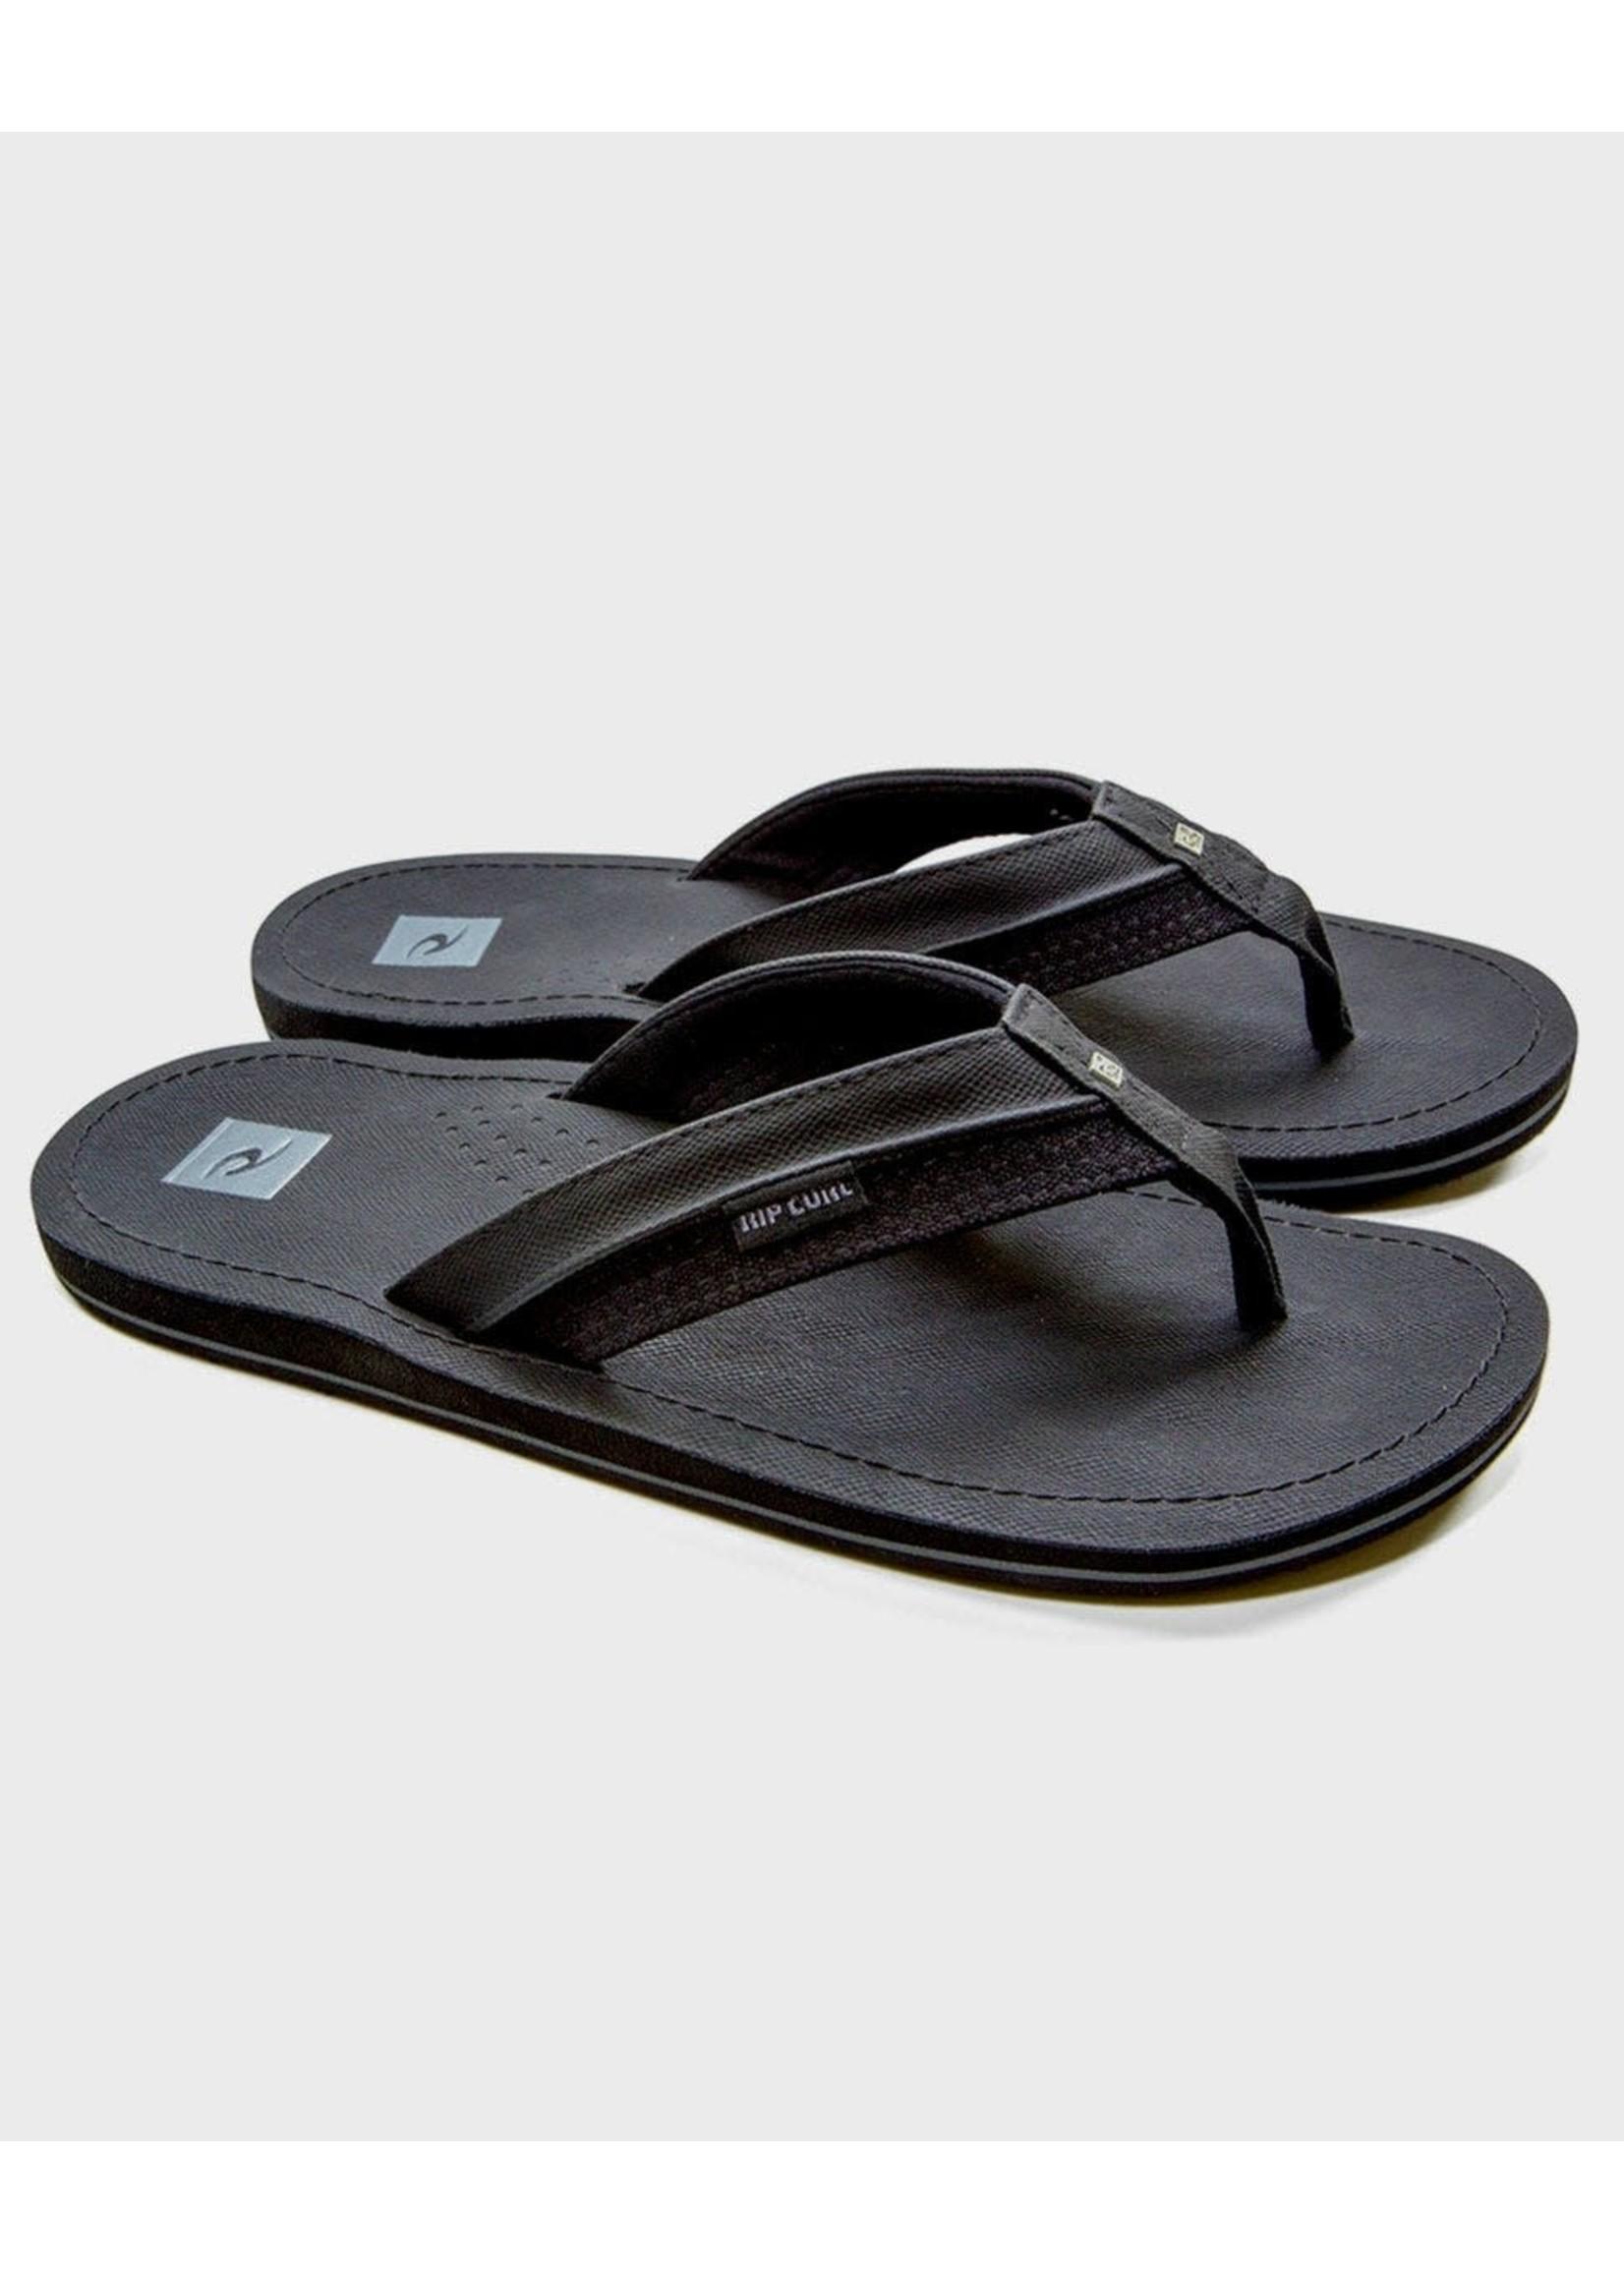 Ripcurl Ripcurl Ox Sandals